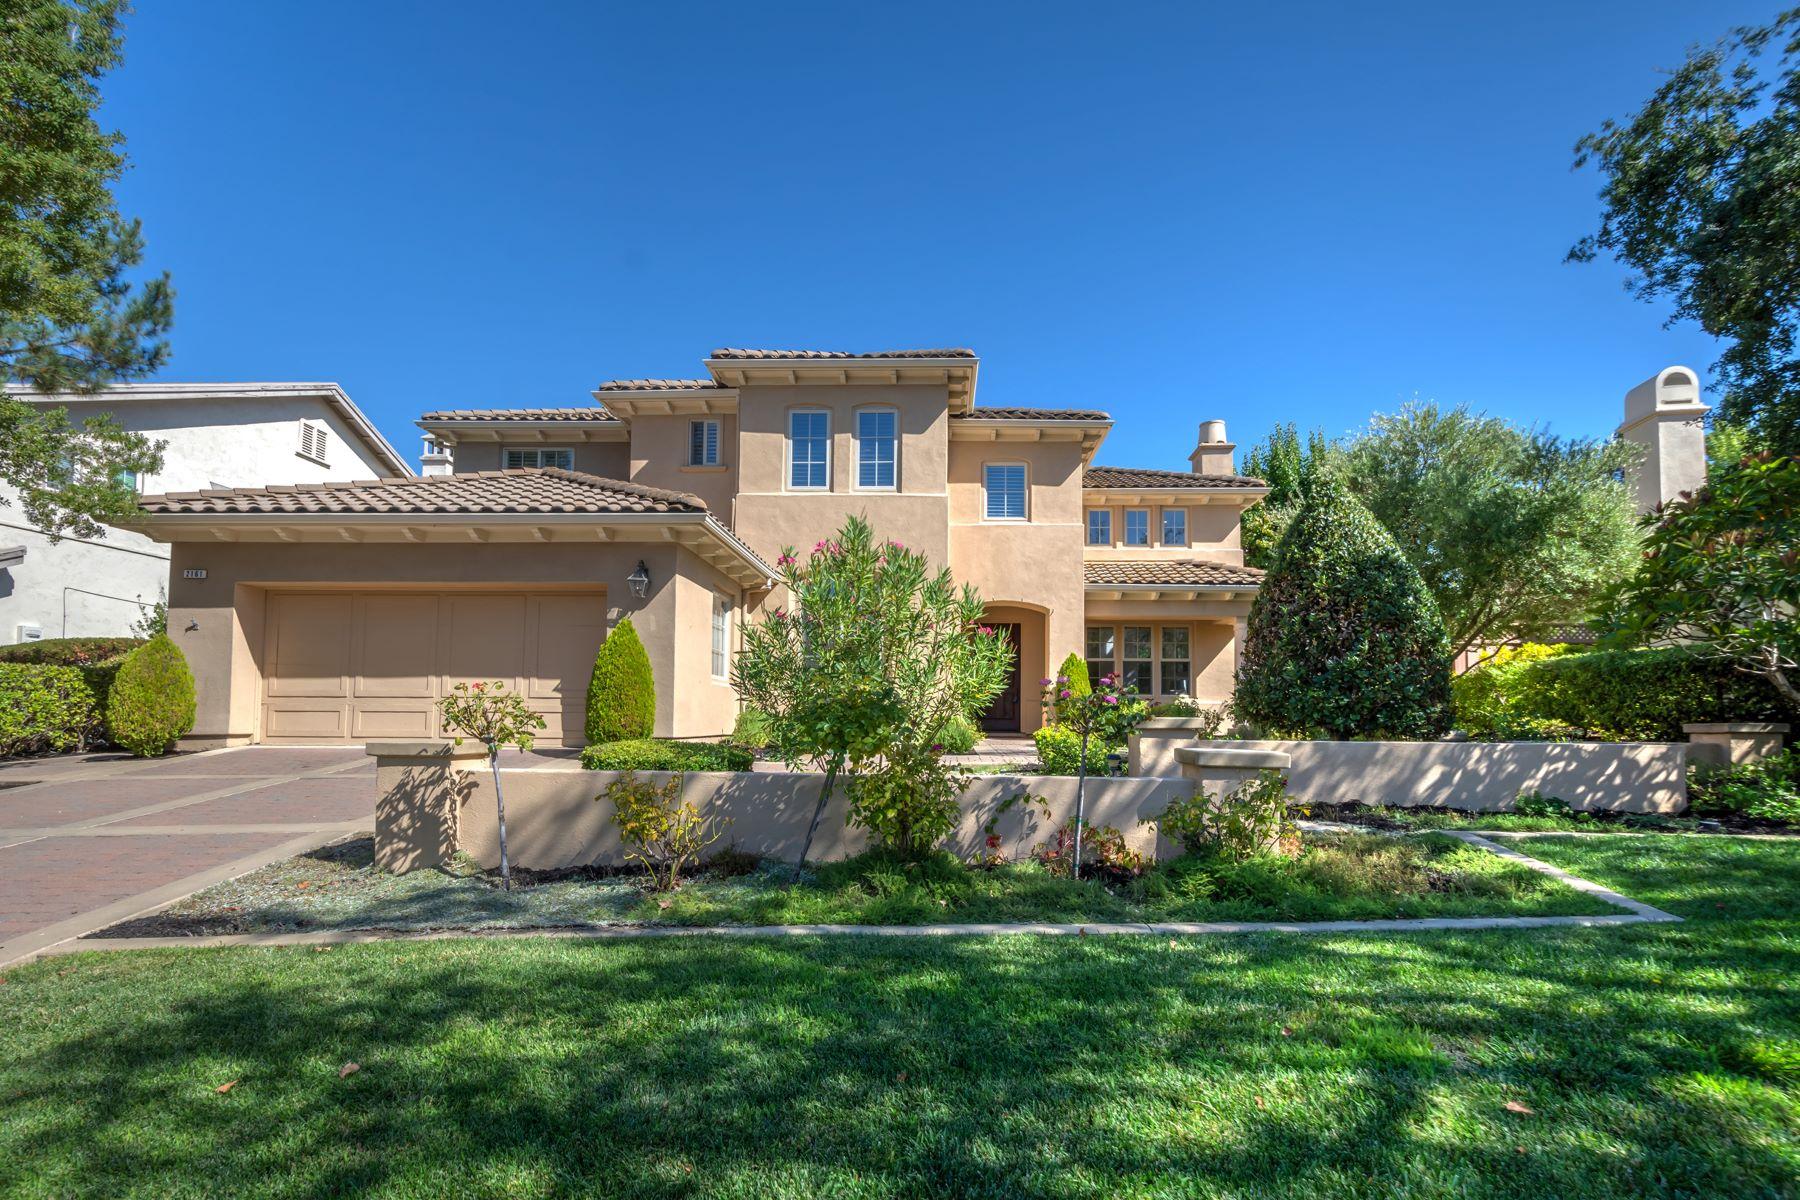 Single Family Homes for Sale at 2161 Pomezia Court, Pleasanton, CA 94566 2161 Pomezia Court Pleasanton, California 94566 United States